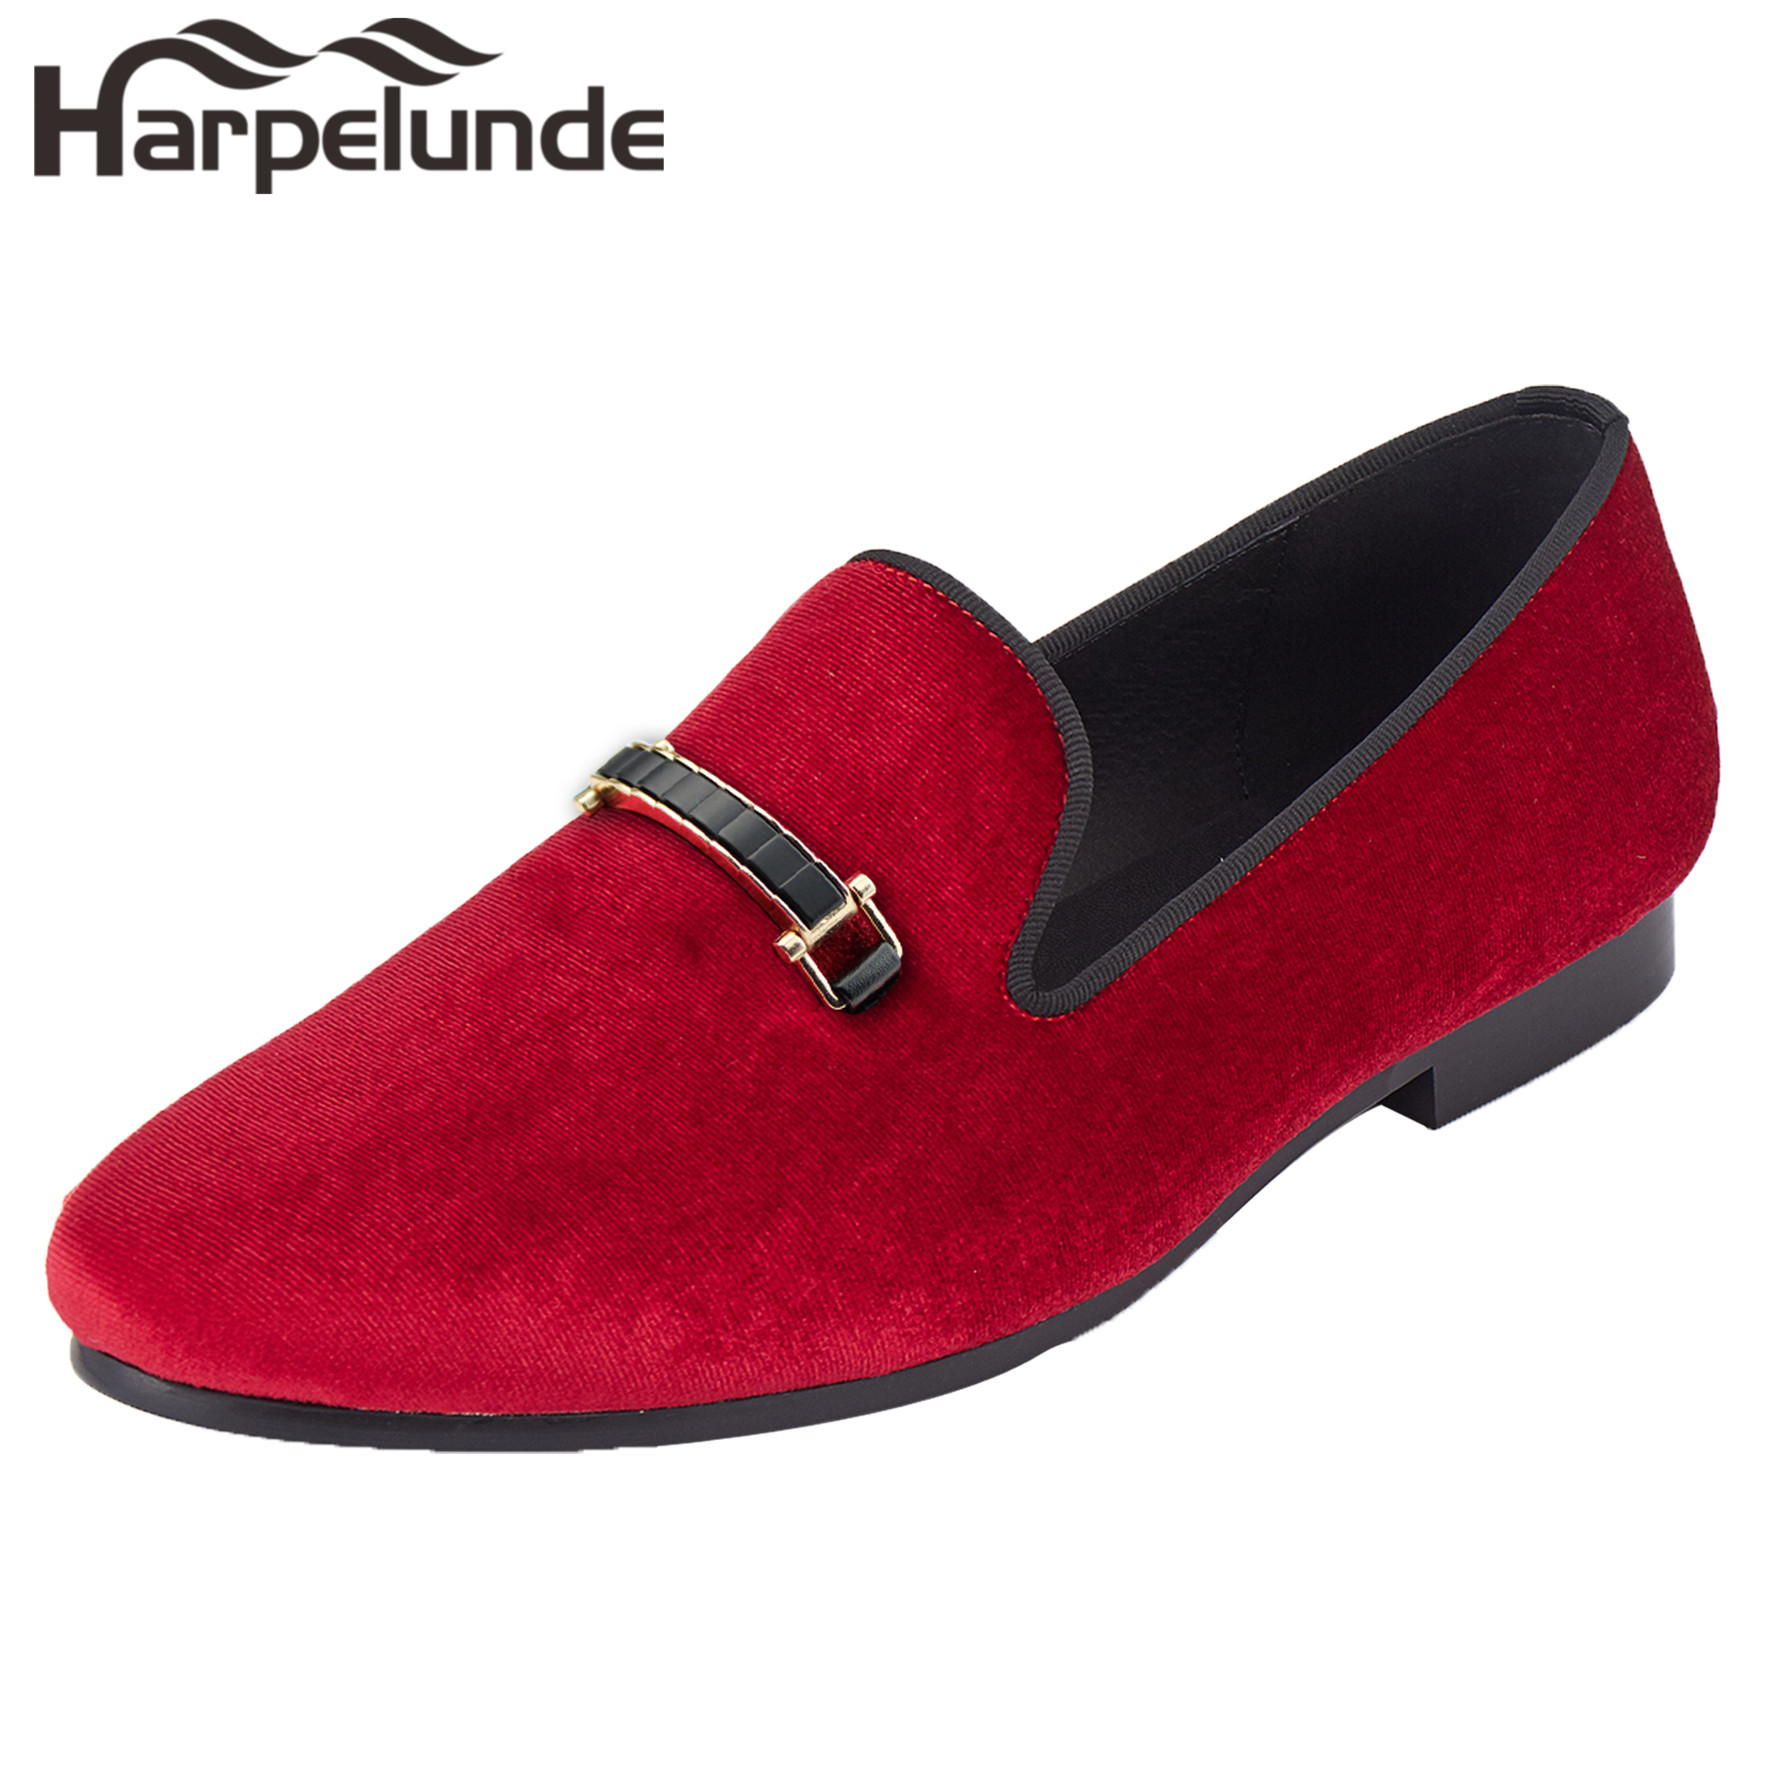 Harpelunde Men Event Flat Shoes Red Velvet Buckle Loafers